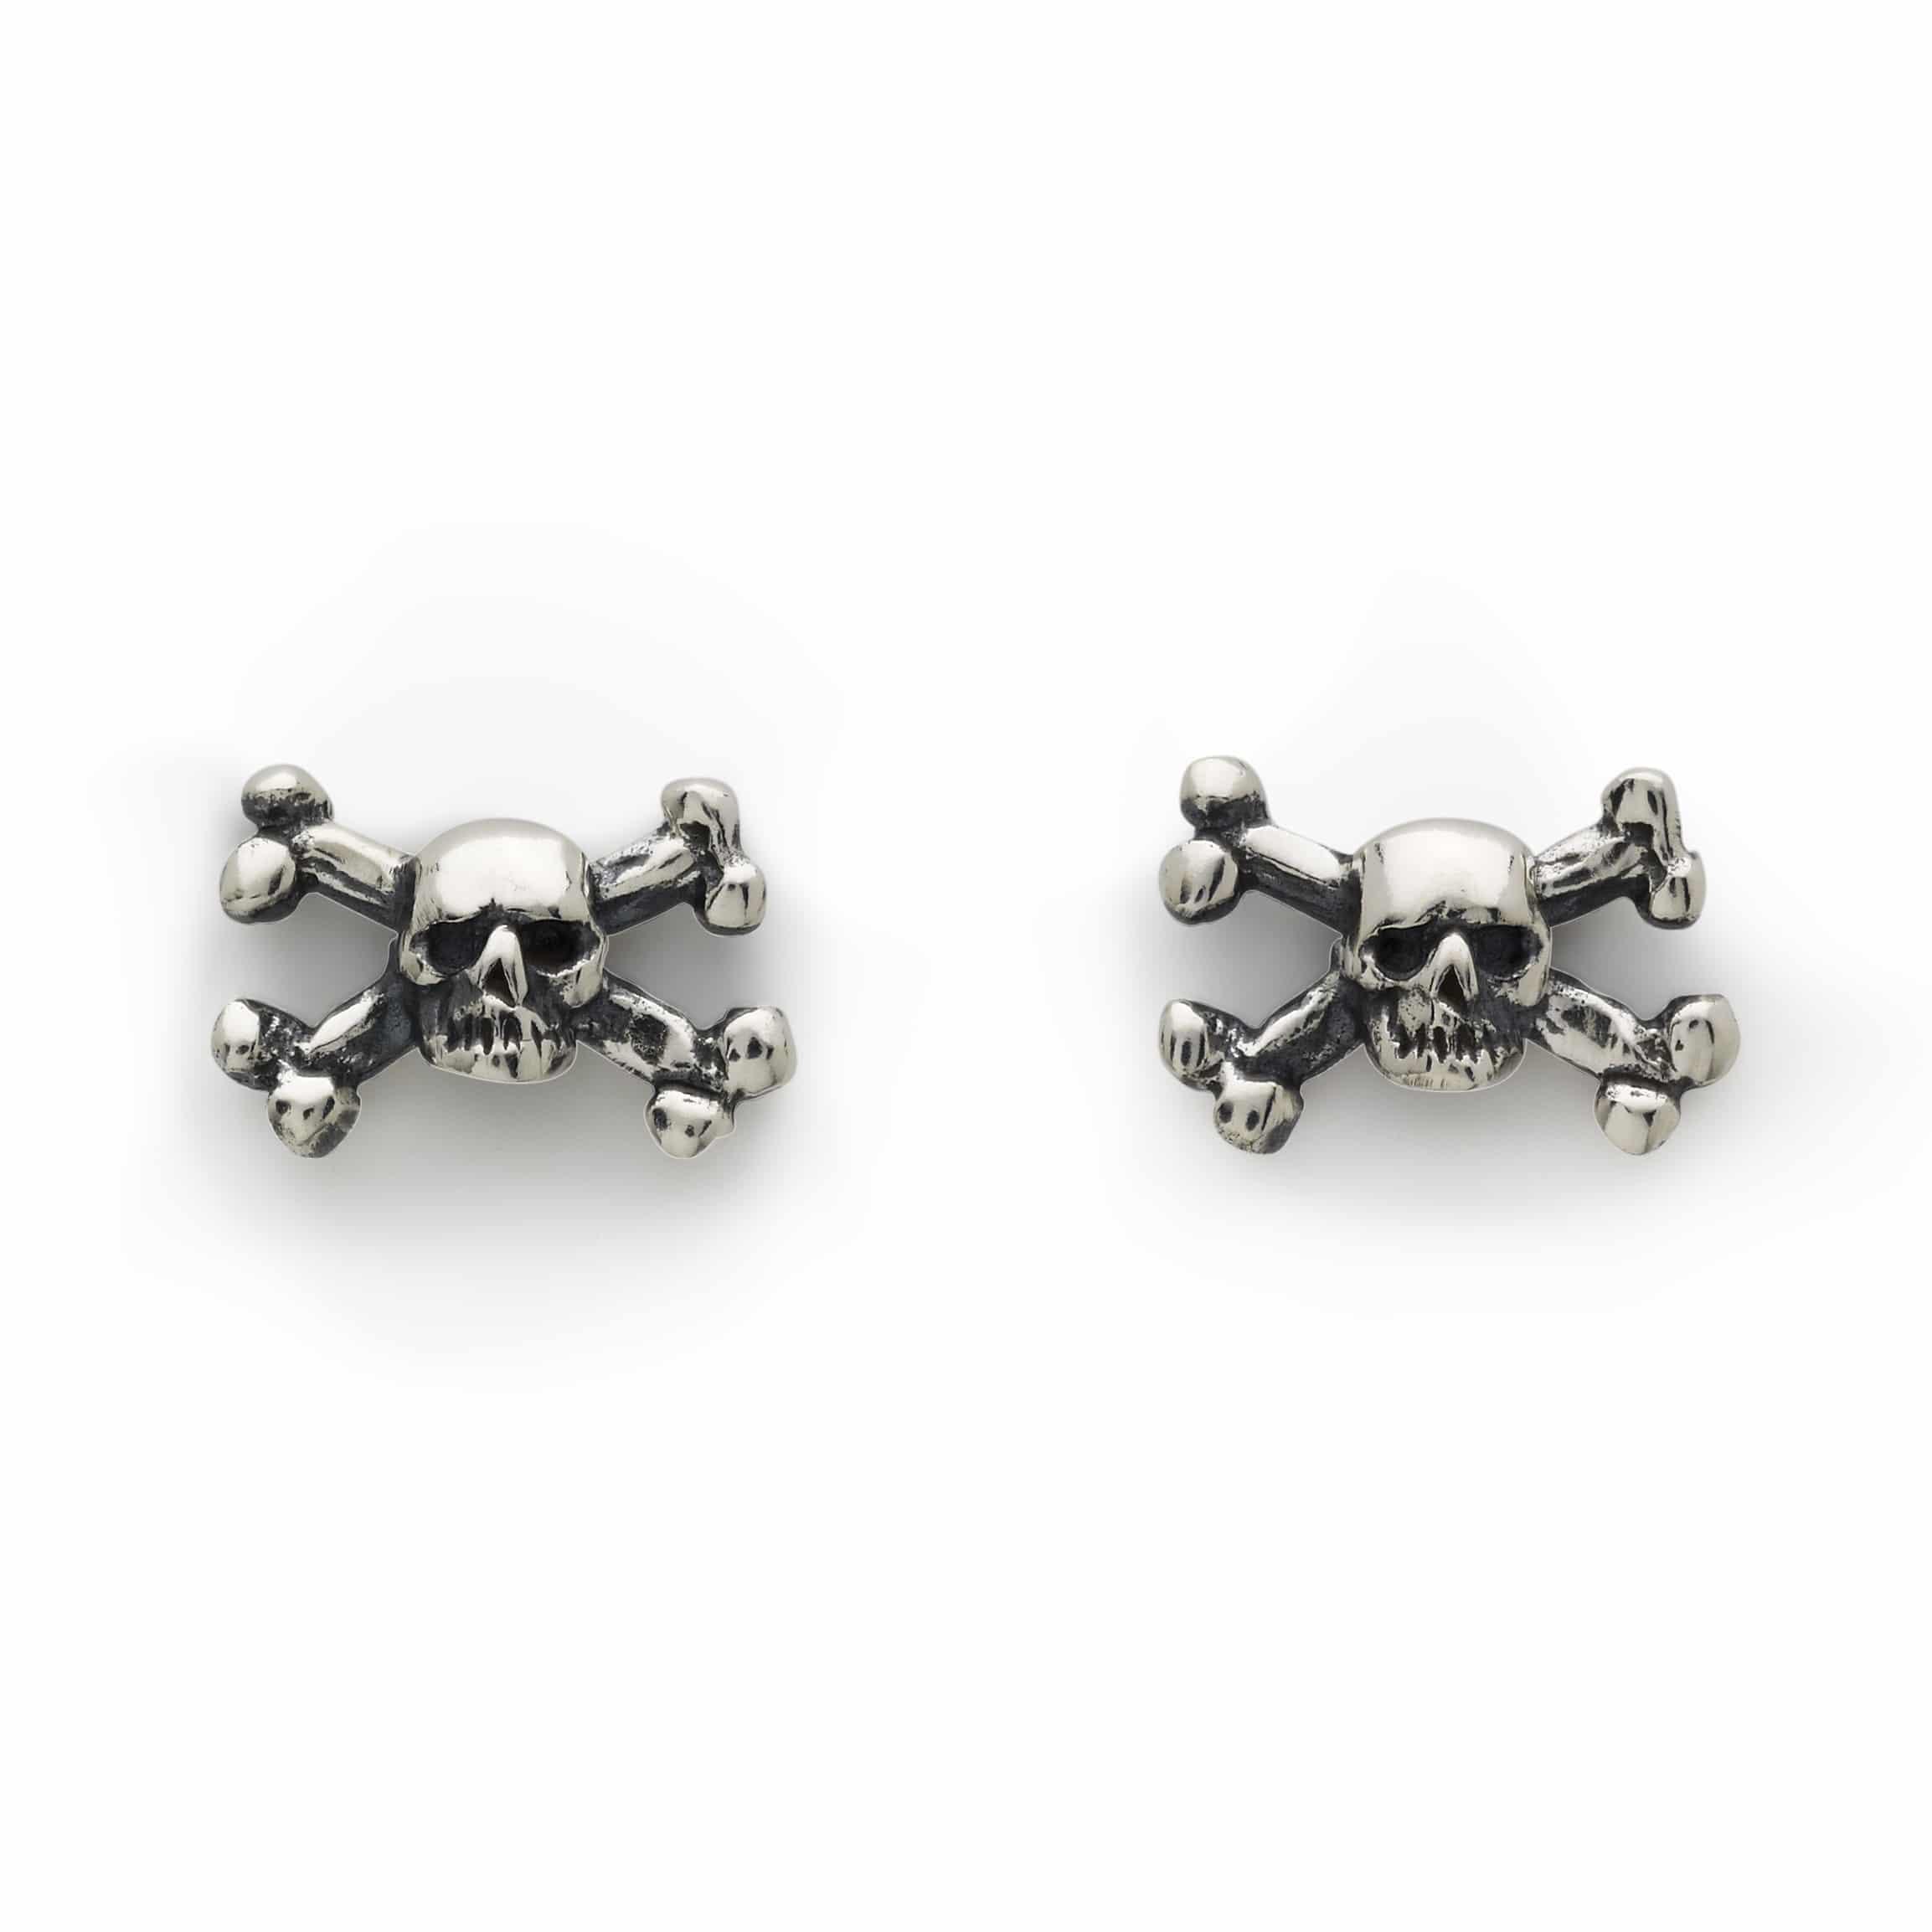 Home Jewellery Earrings Skull Crossbones Studs